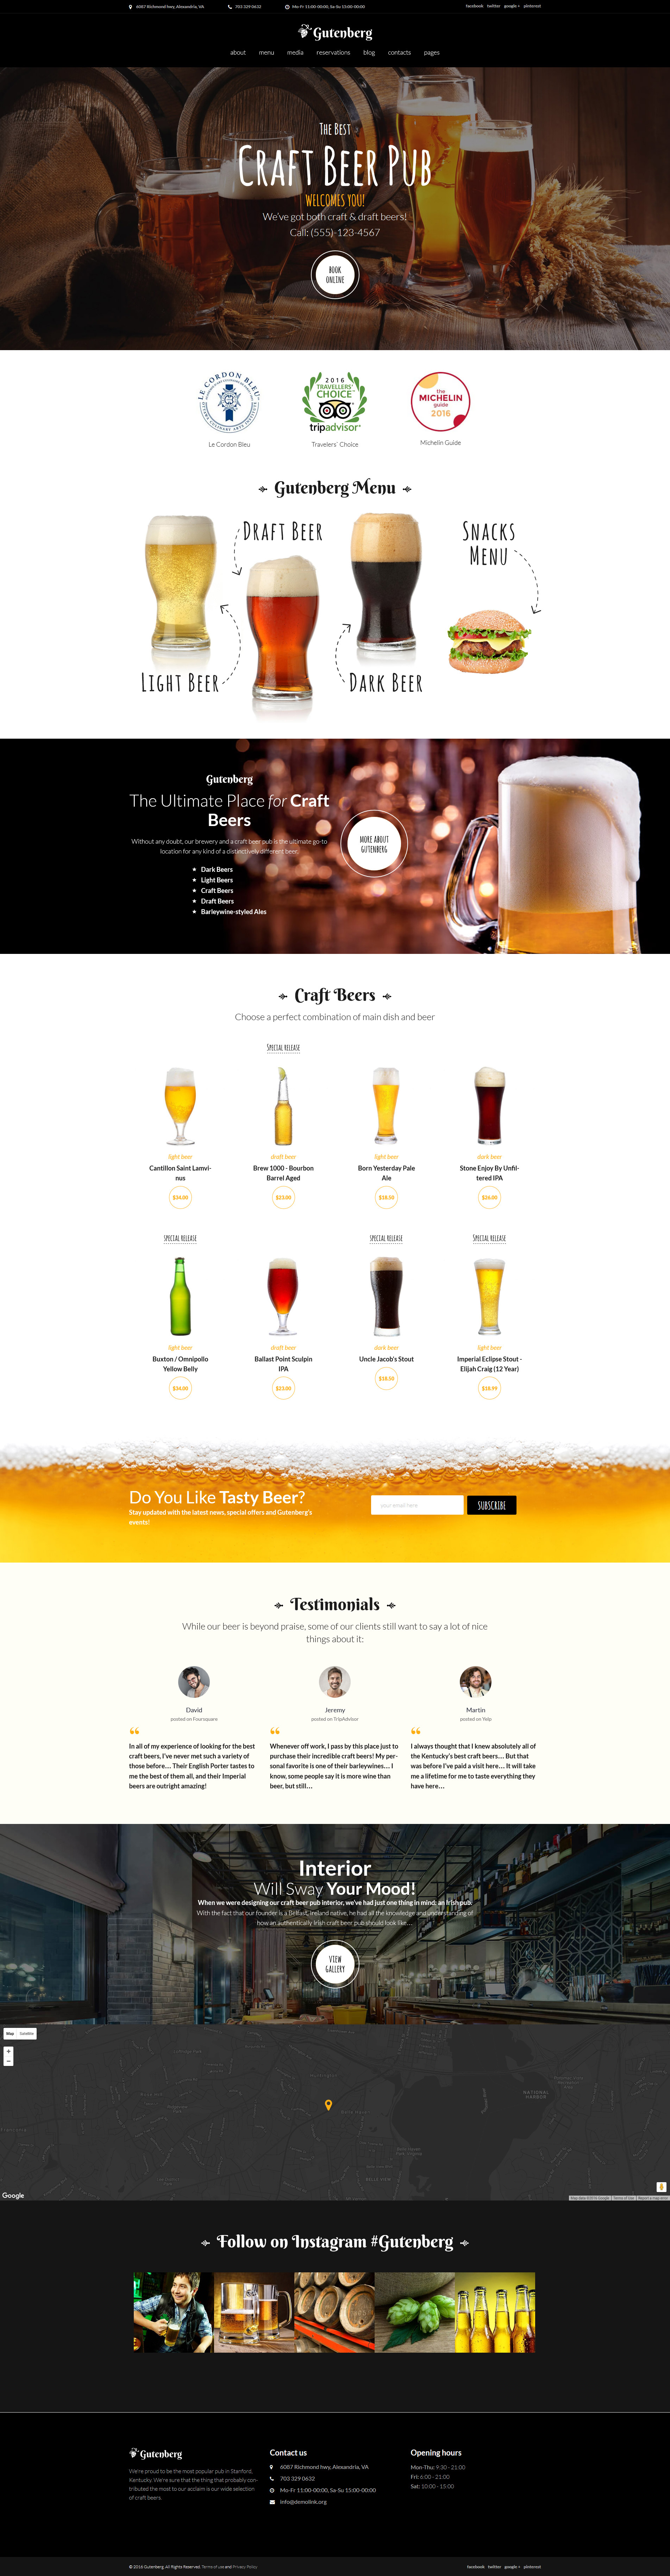 Responsive GutenBerg - Beer Pub and Brewery Wordpress #59005